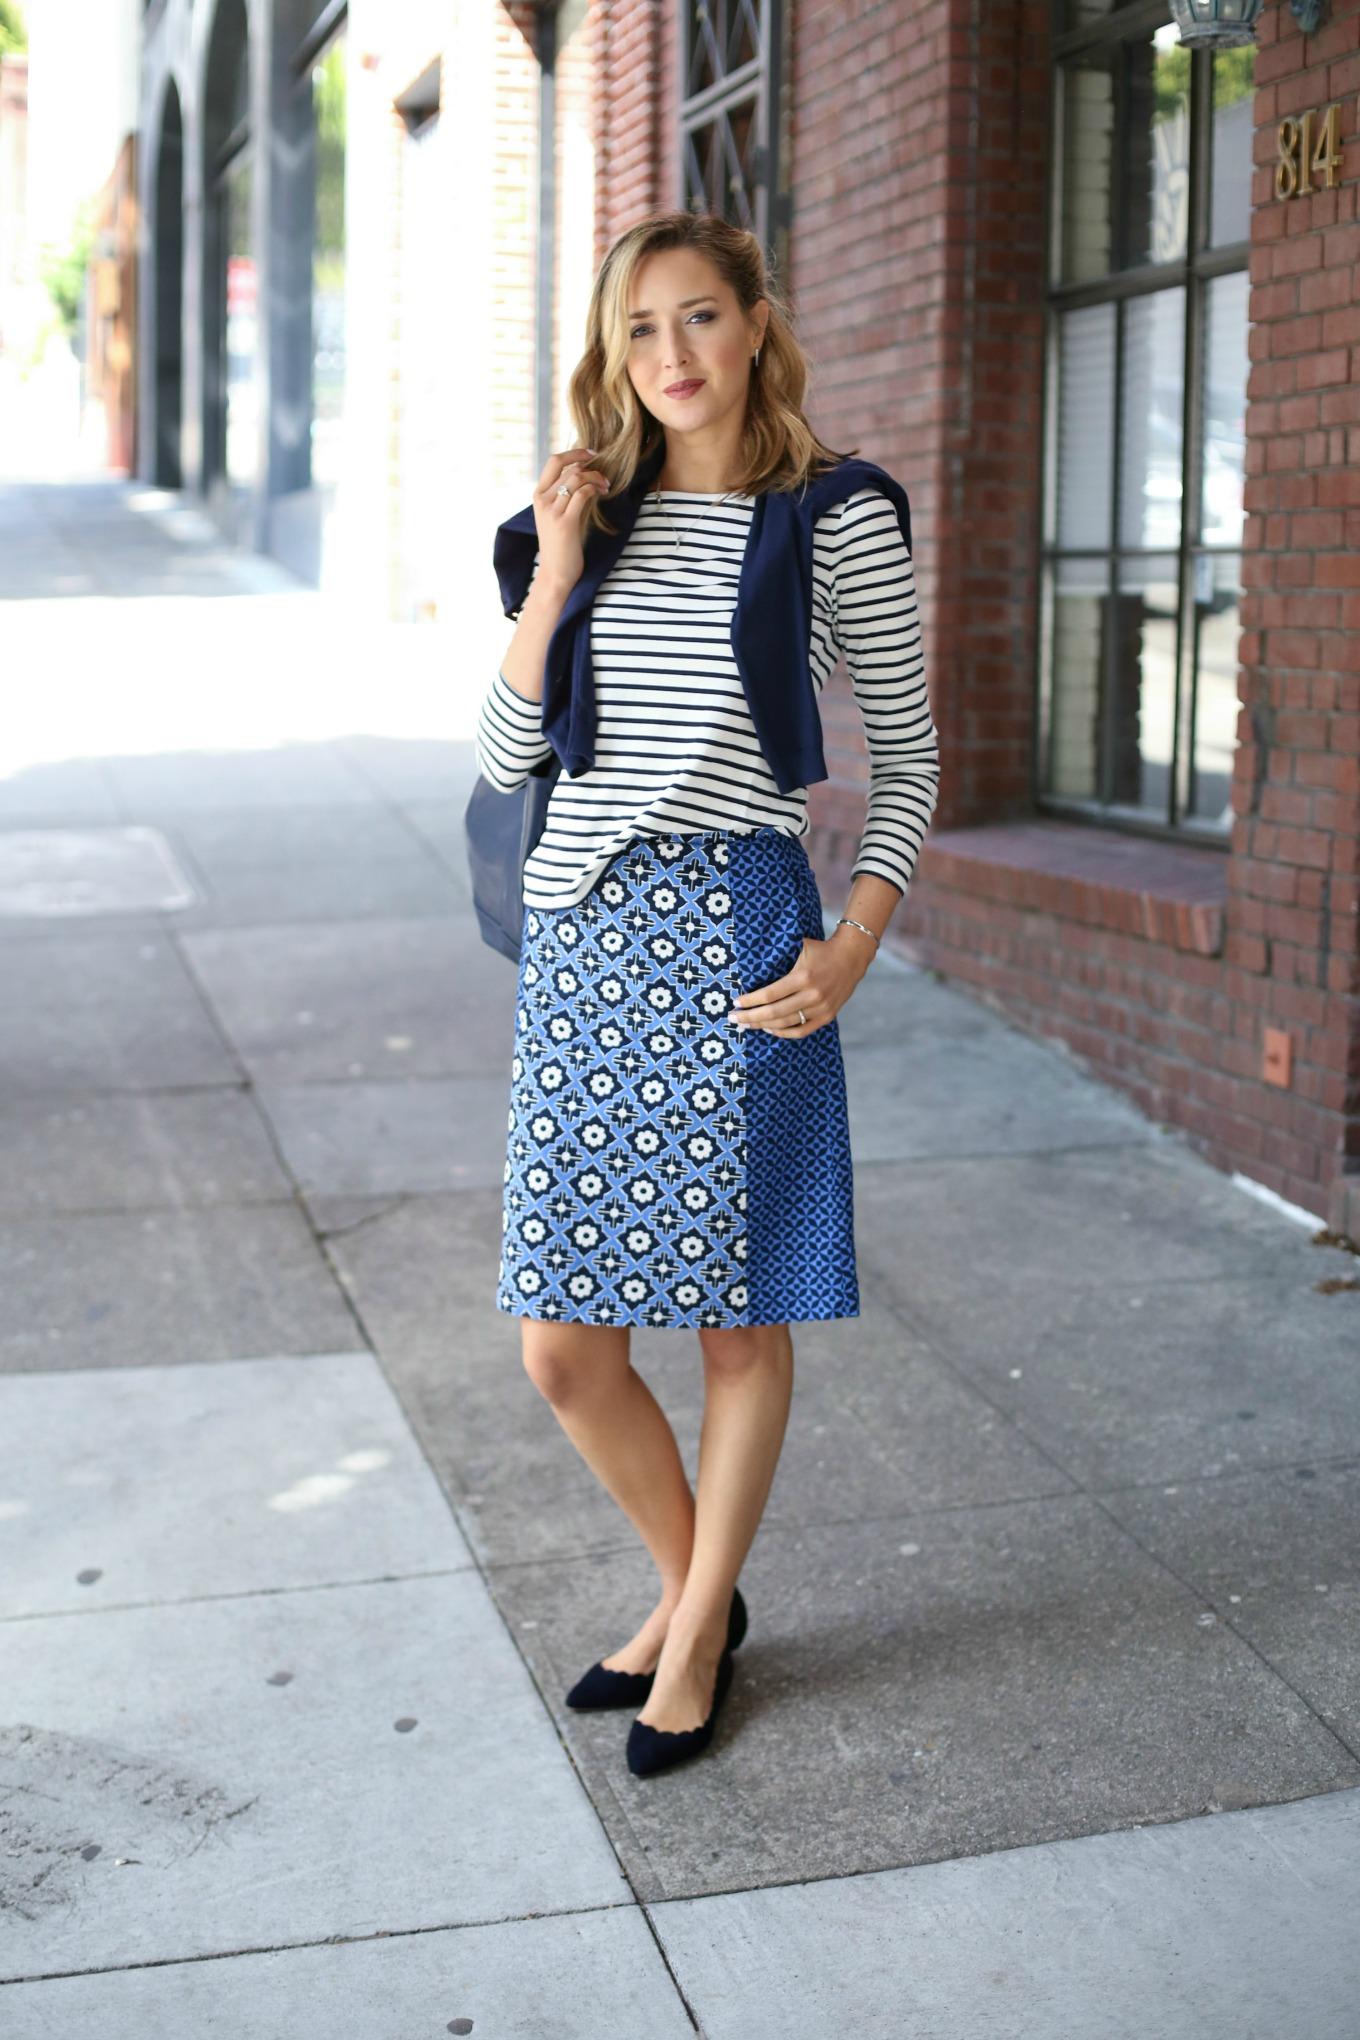 Spring Print Mix Memorandum Nyc Fashion Amp Lifestyle